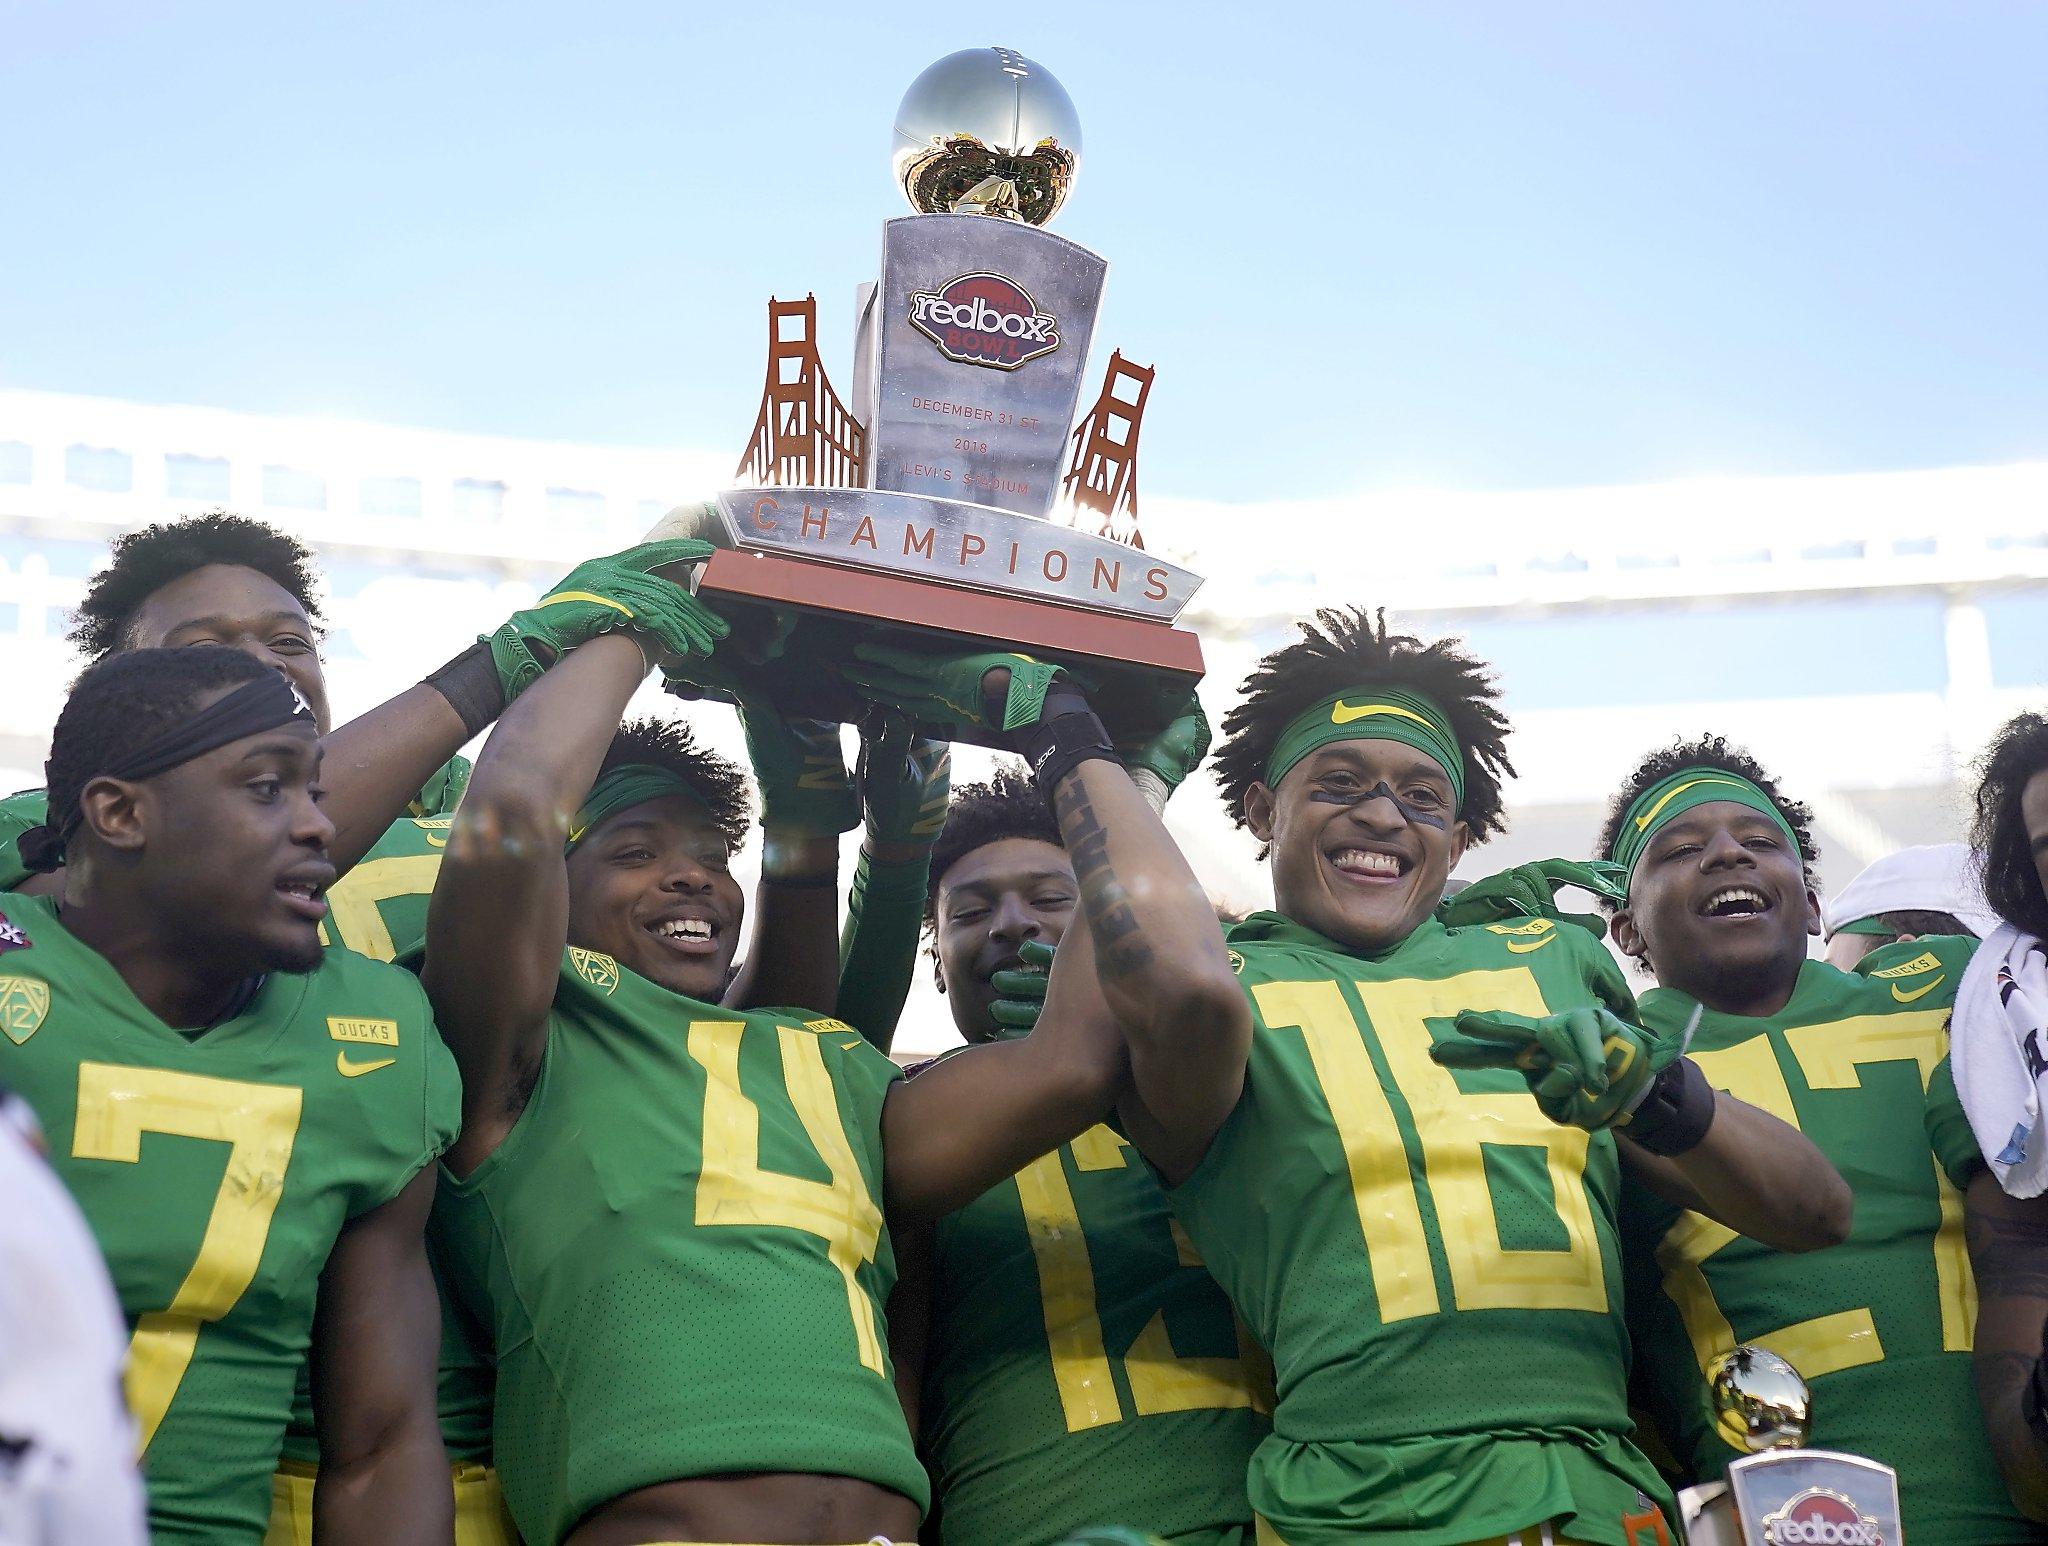 Oregon wins sloppy Redbox Bowl over Michigan State - SFGate